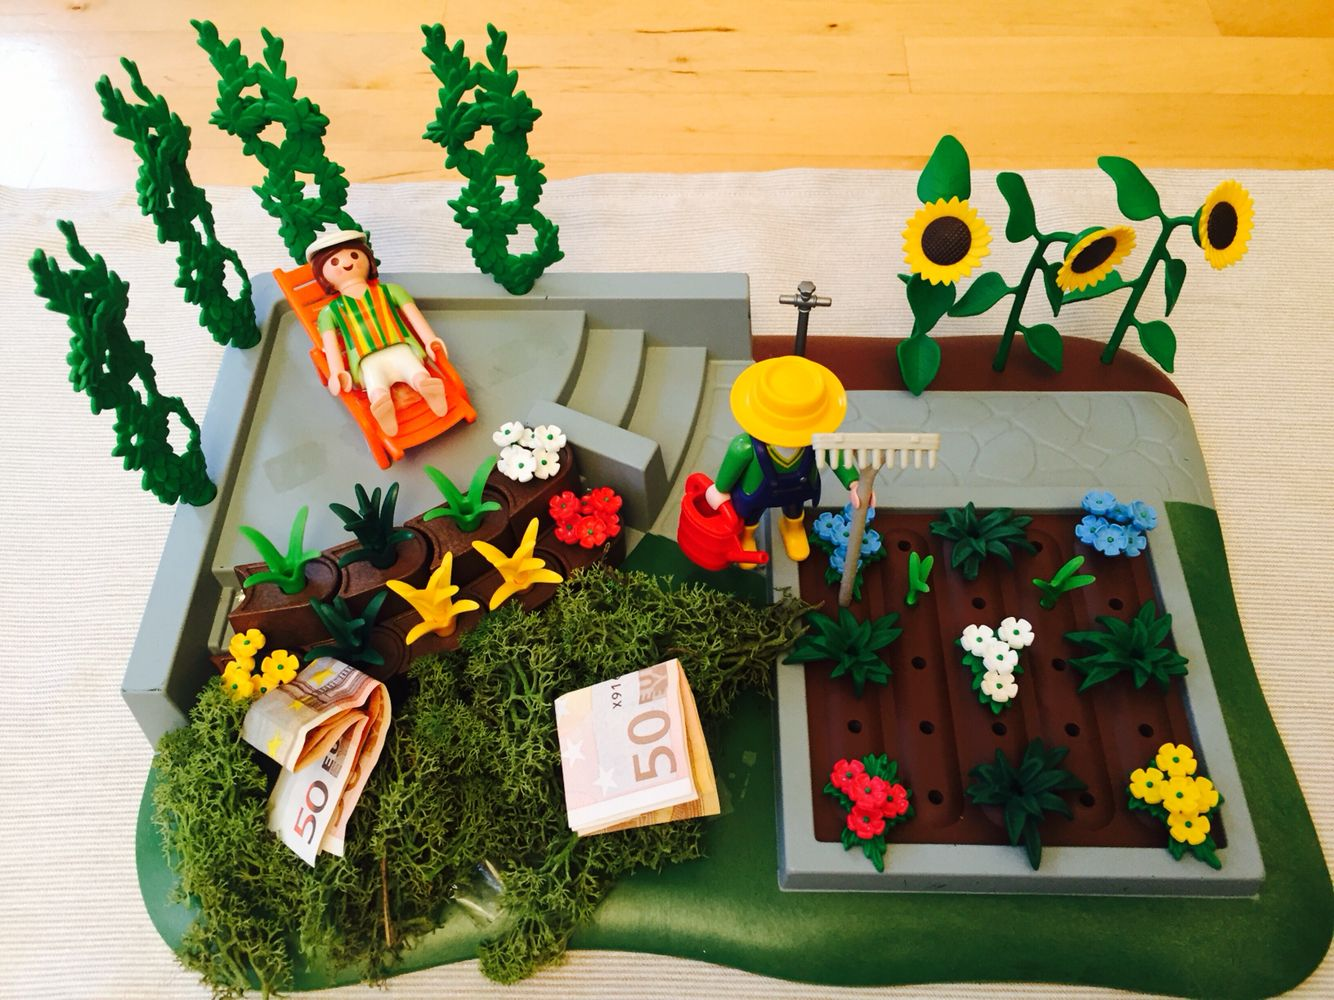 Supertolles playmobil garten geldgeschenk geschenke - Playmobil basteln ...